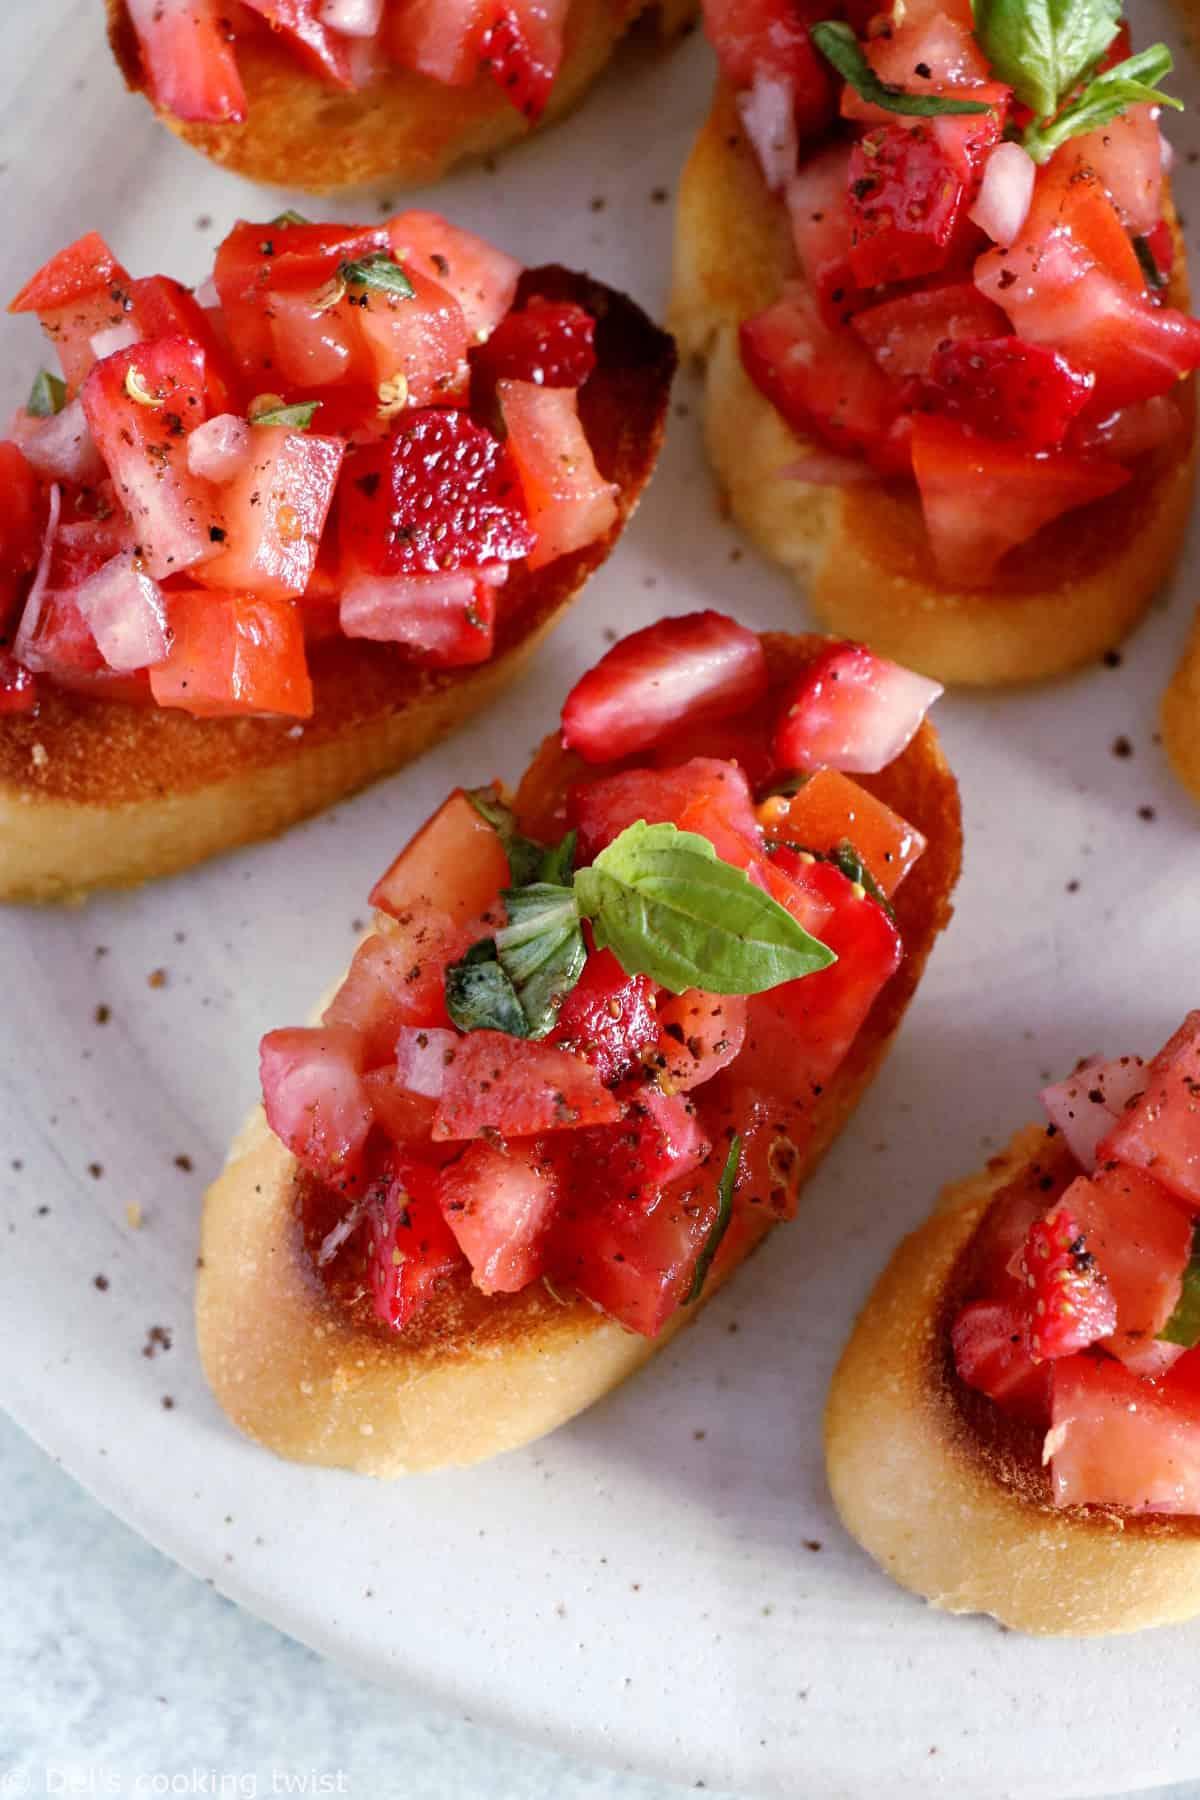 Strawberry Tomato Bruschetta is an easy summer snack appetizer.